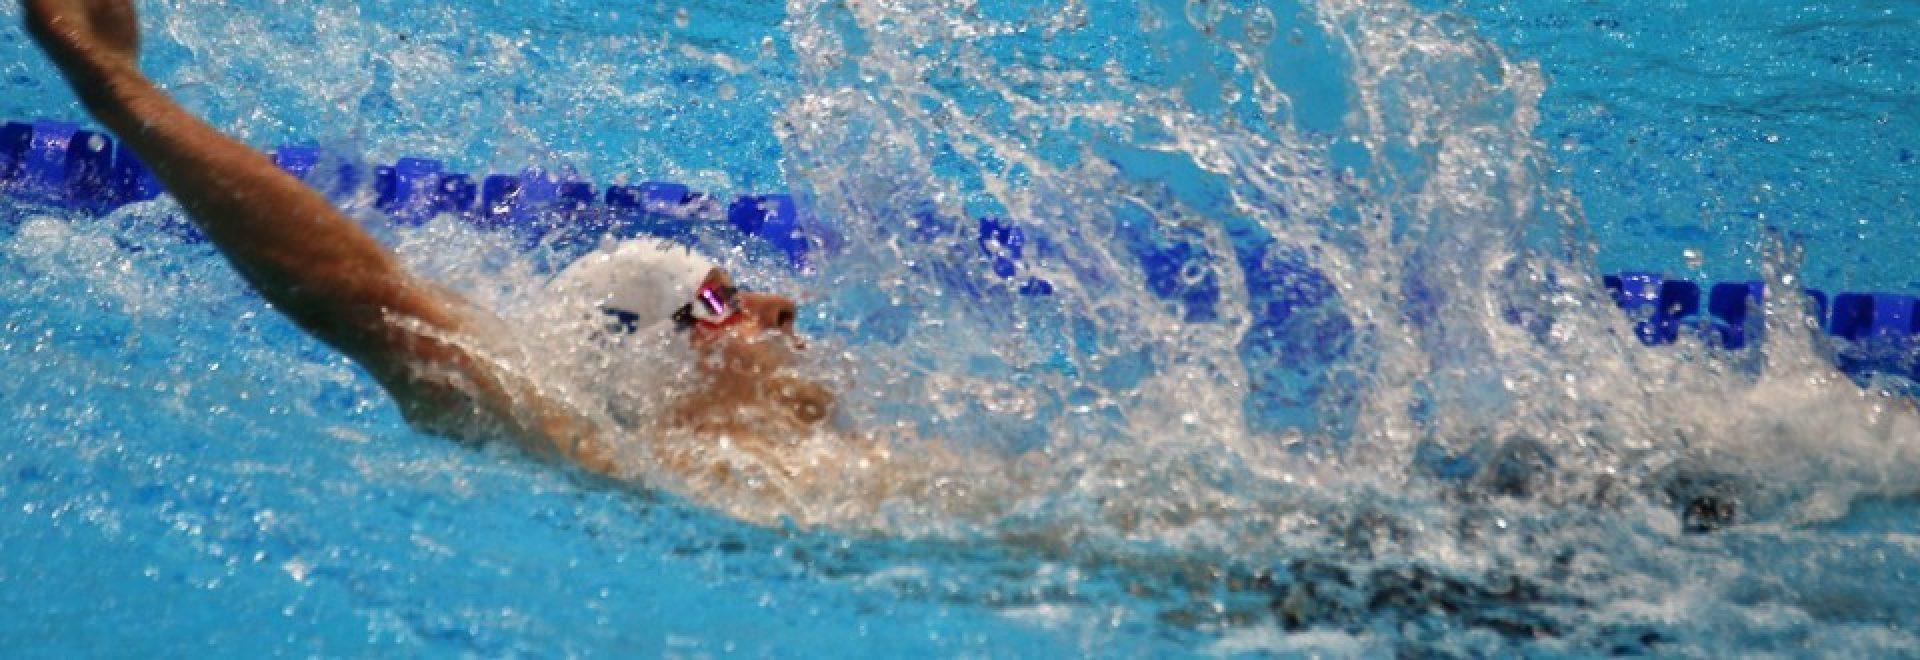 שחיין שוחה גב